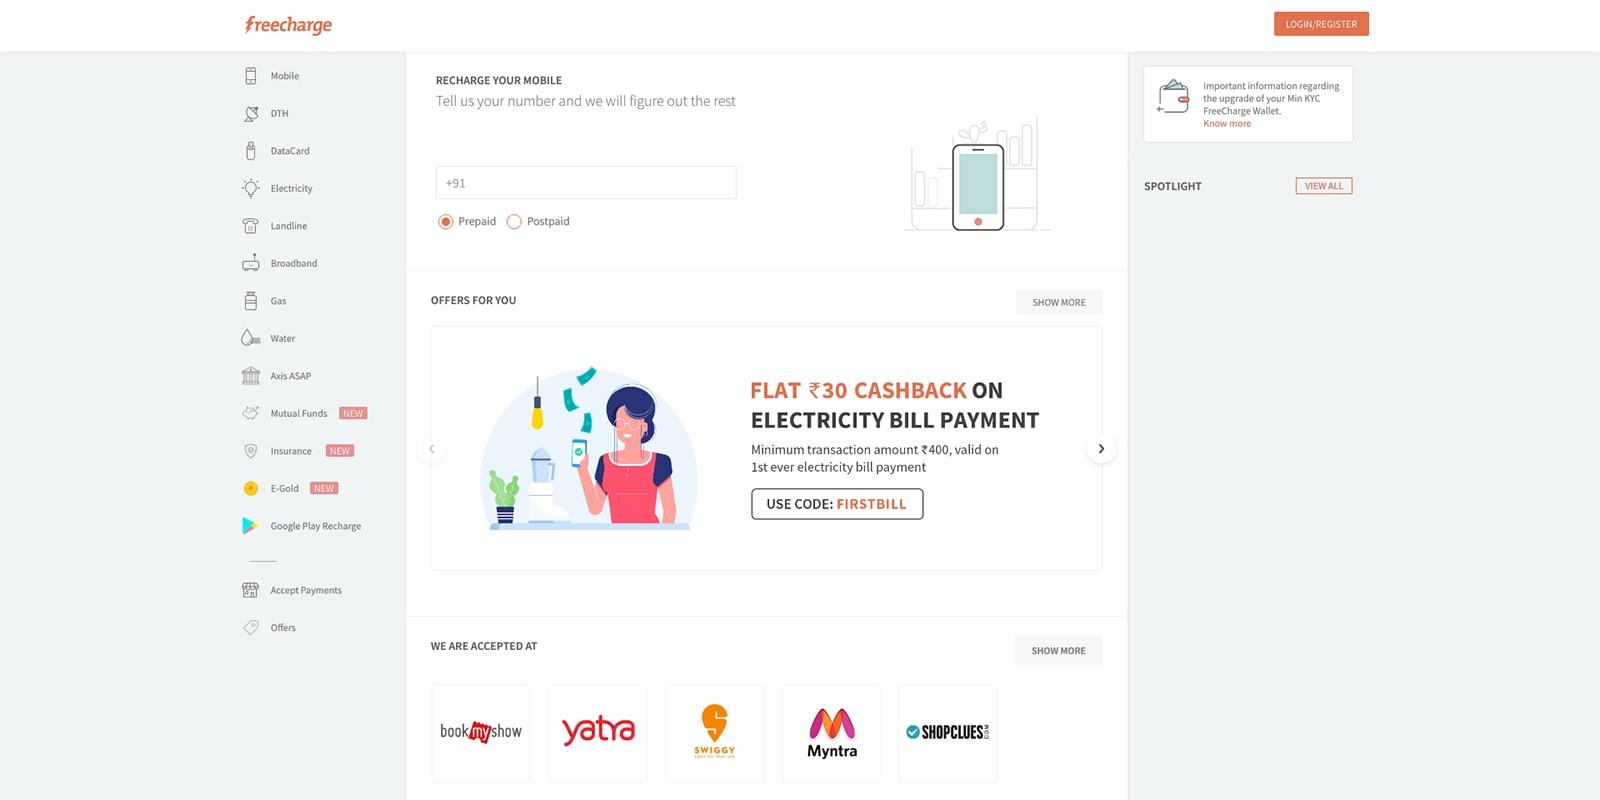 Freecharge Go Mastercard